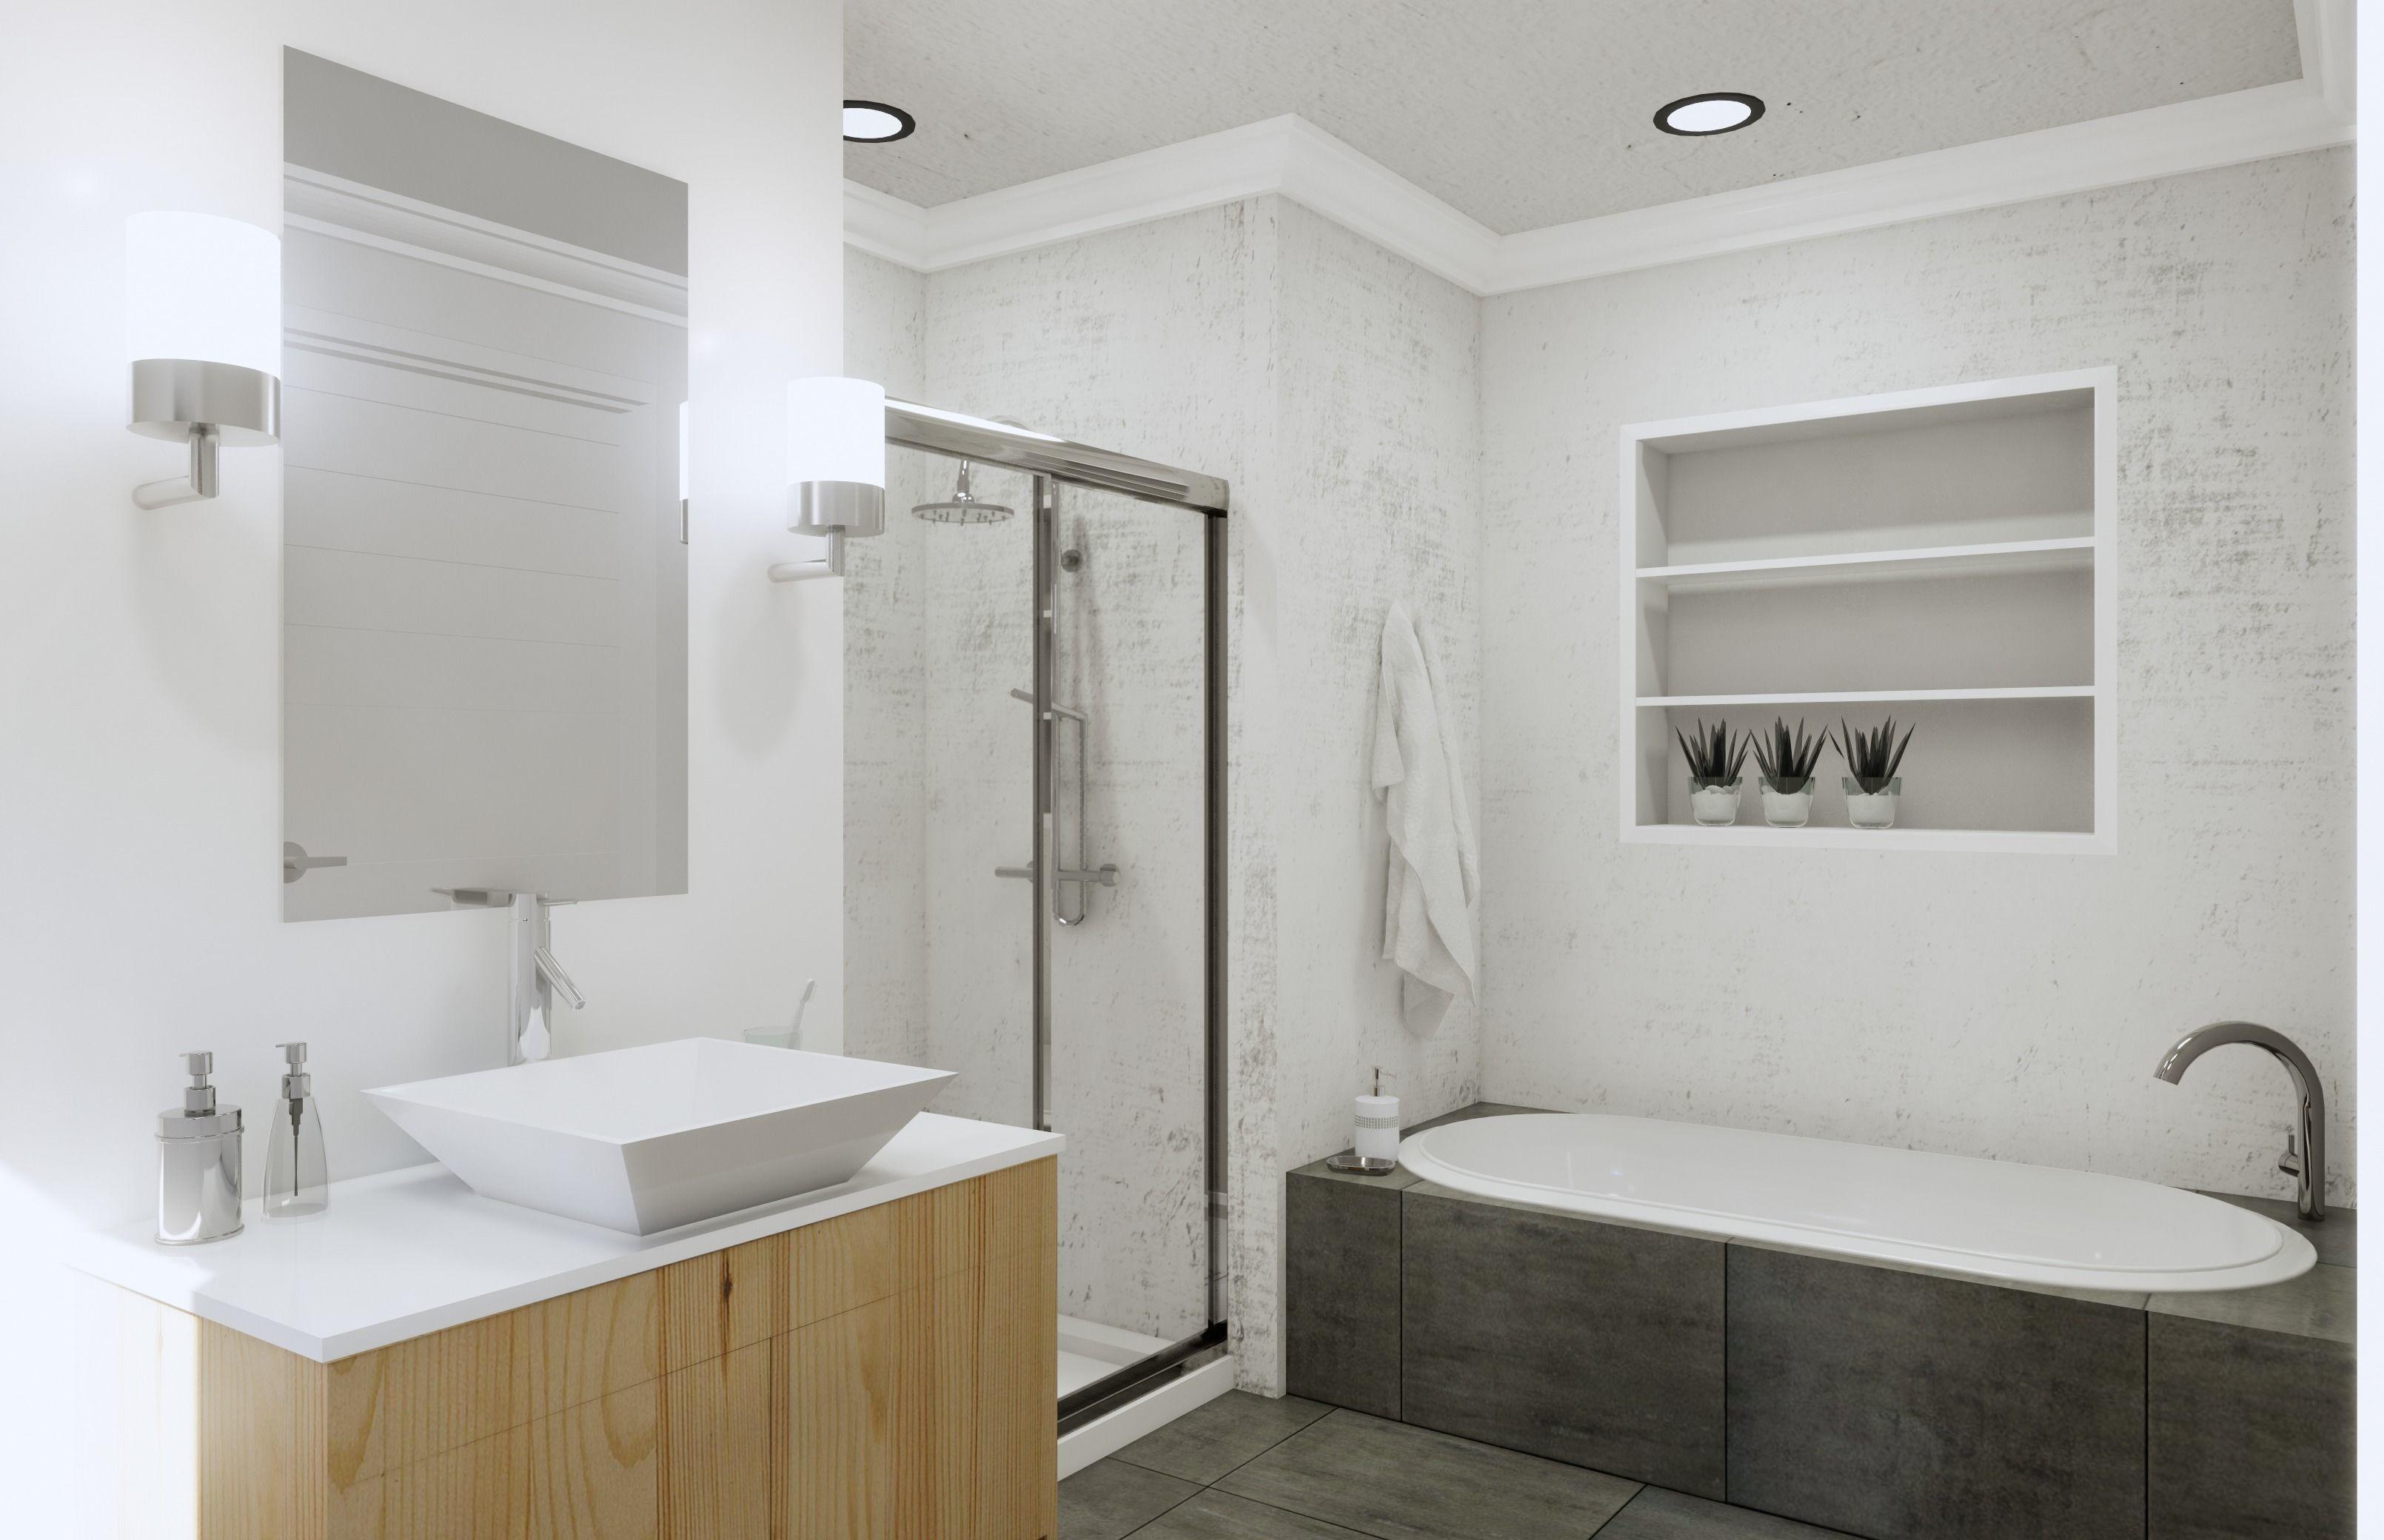 Bathroom Revit Model Scene low-poly   CGTrader on Bathroom Model  id=96175